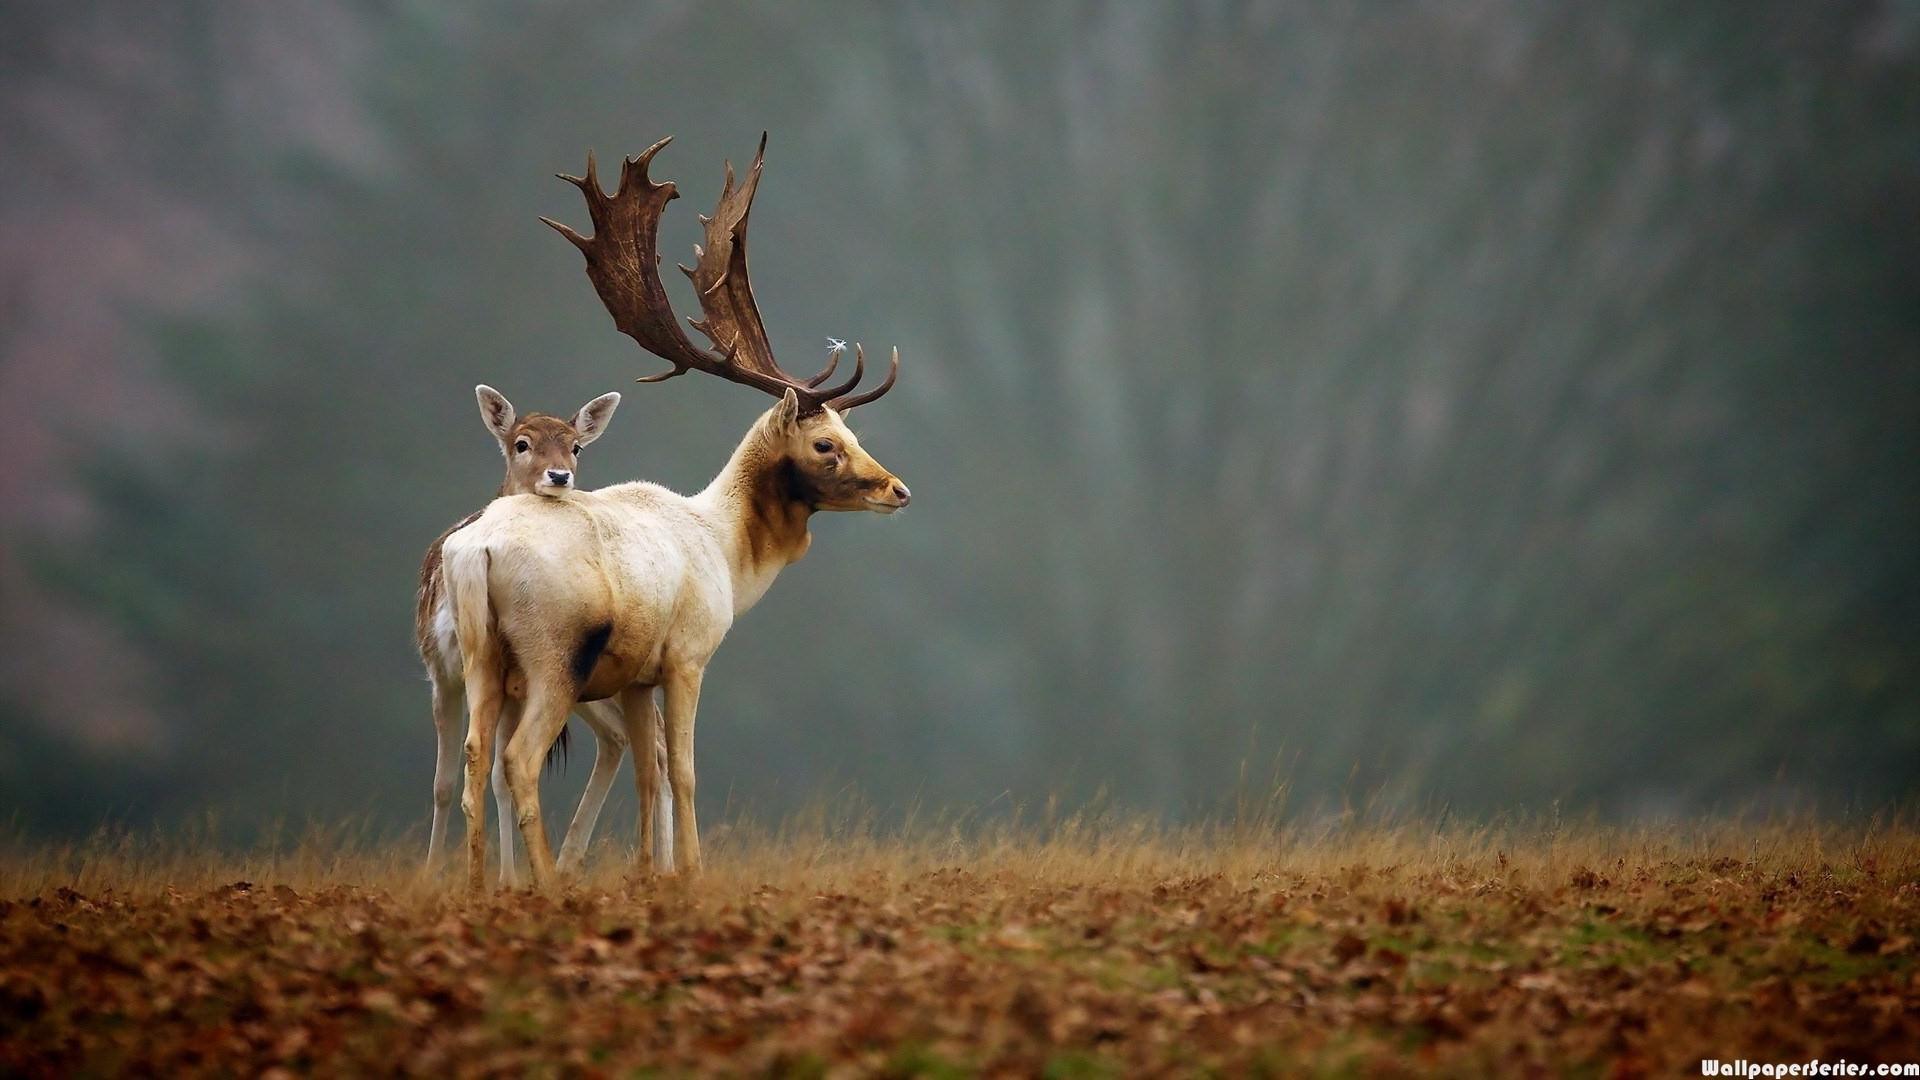 Amazing 3d Wallpapers 1080p Hd Deer Nature Wallpaper Download Free 140585